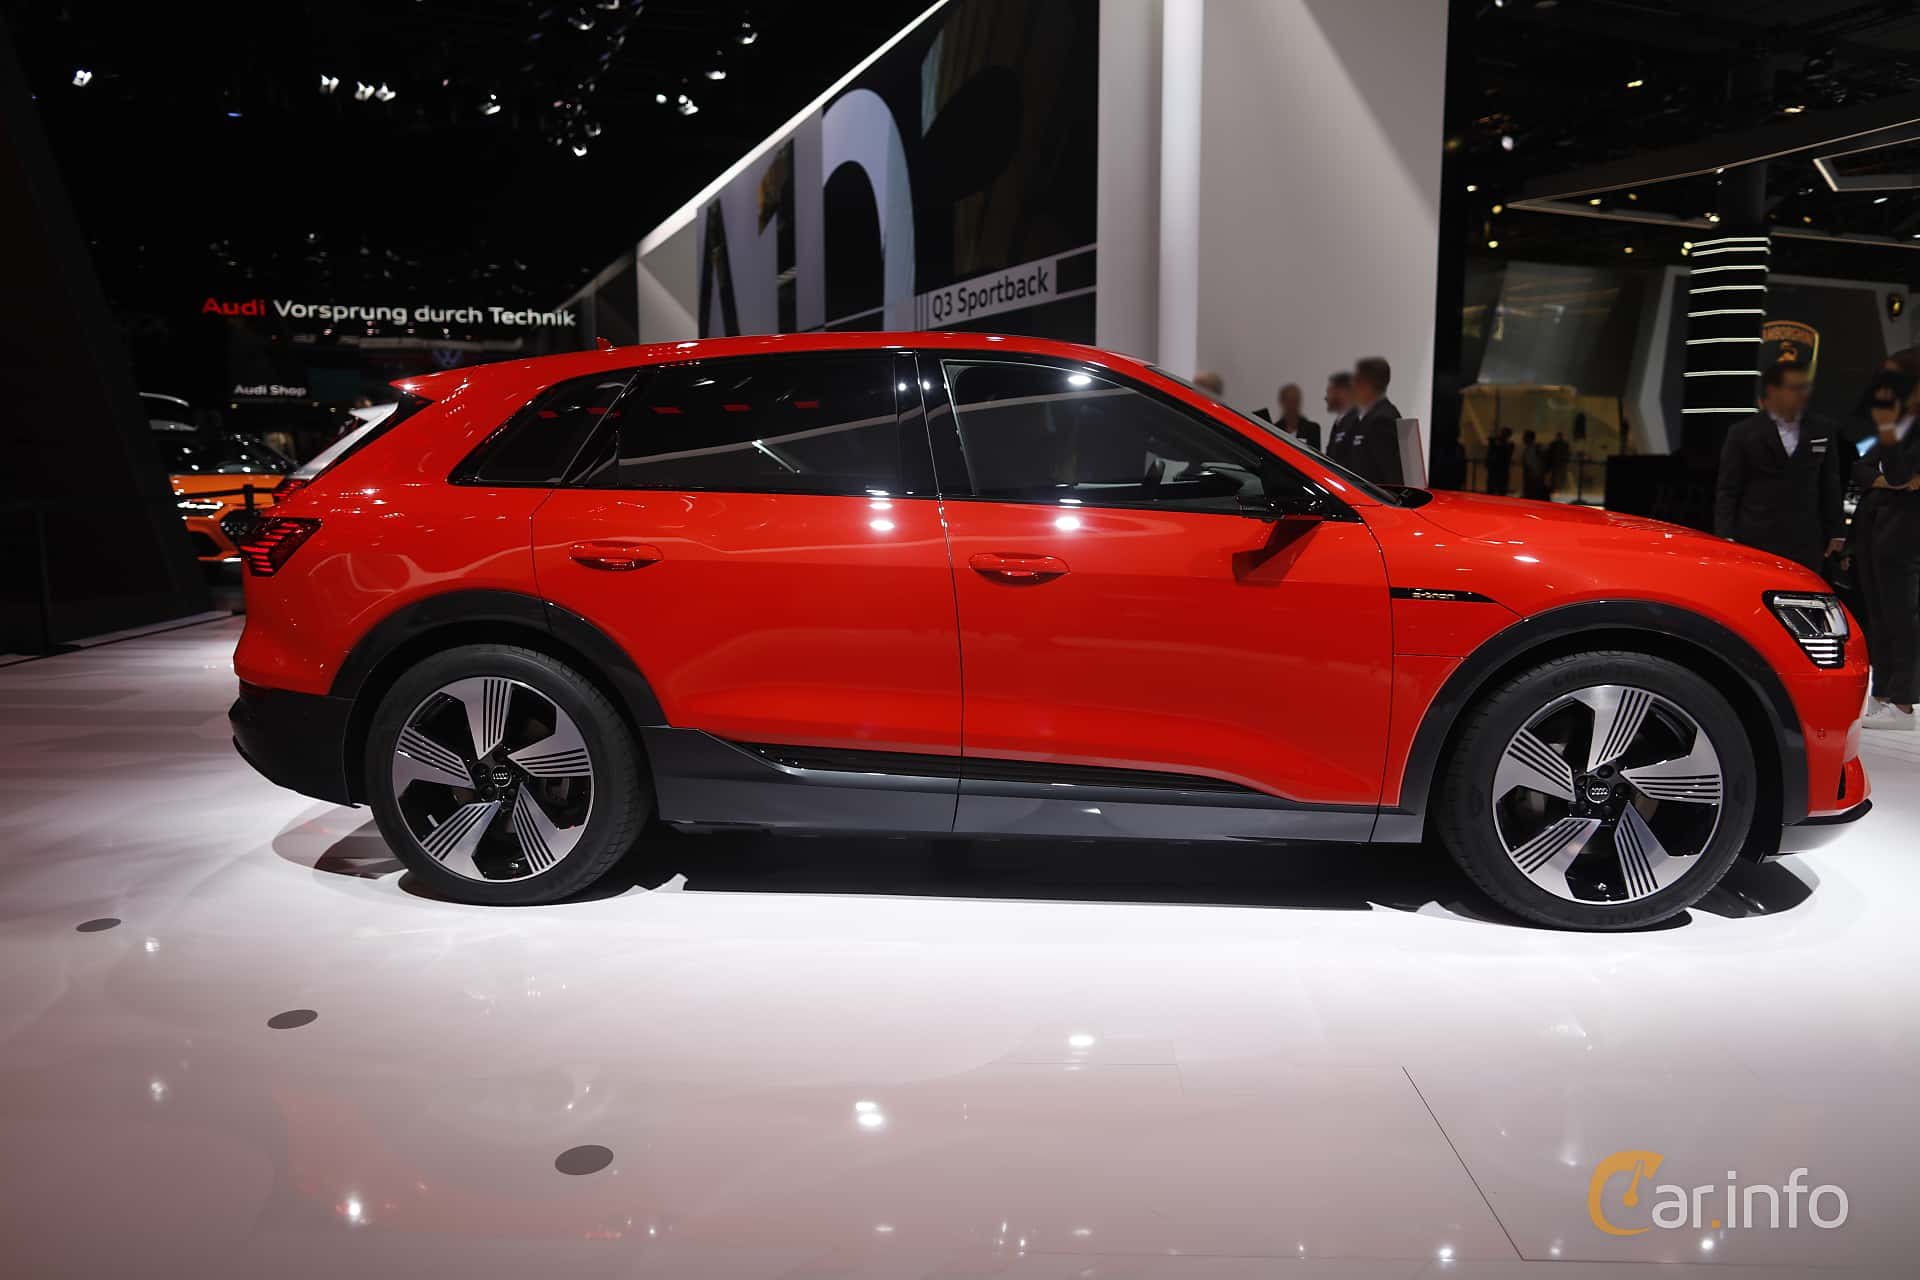 Audi e-tron 55 quattro  Single Speed, 408hp, 2020 at IAA 2019